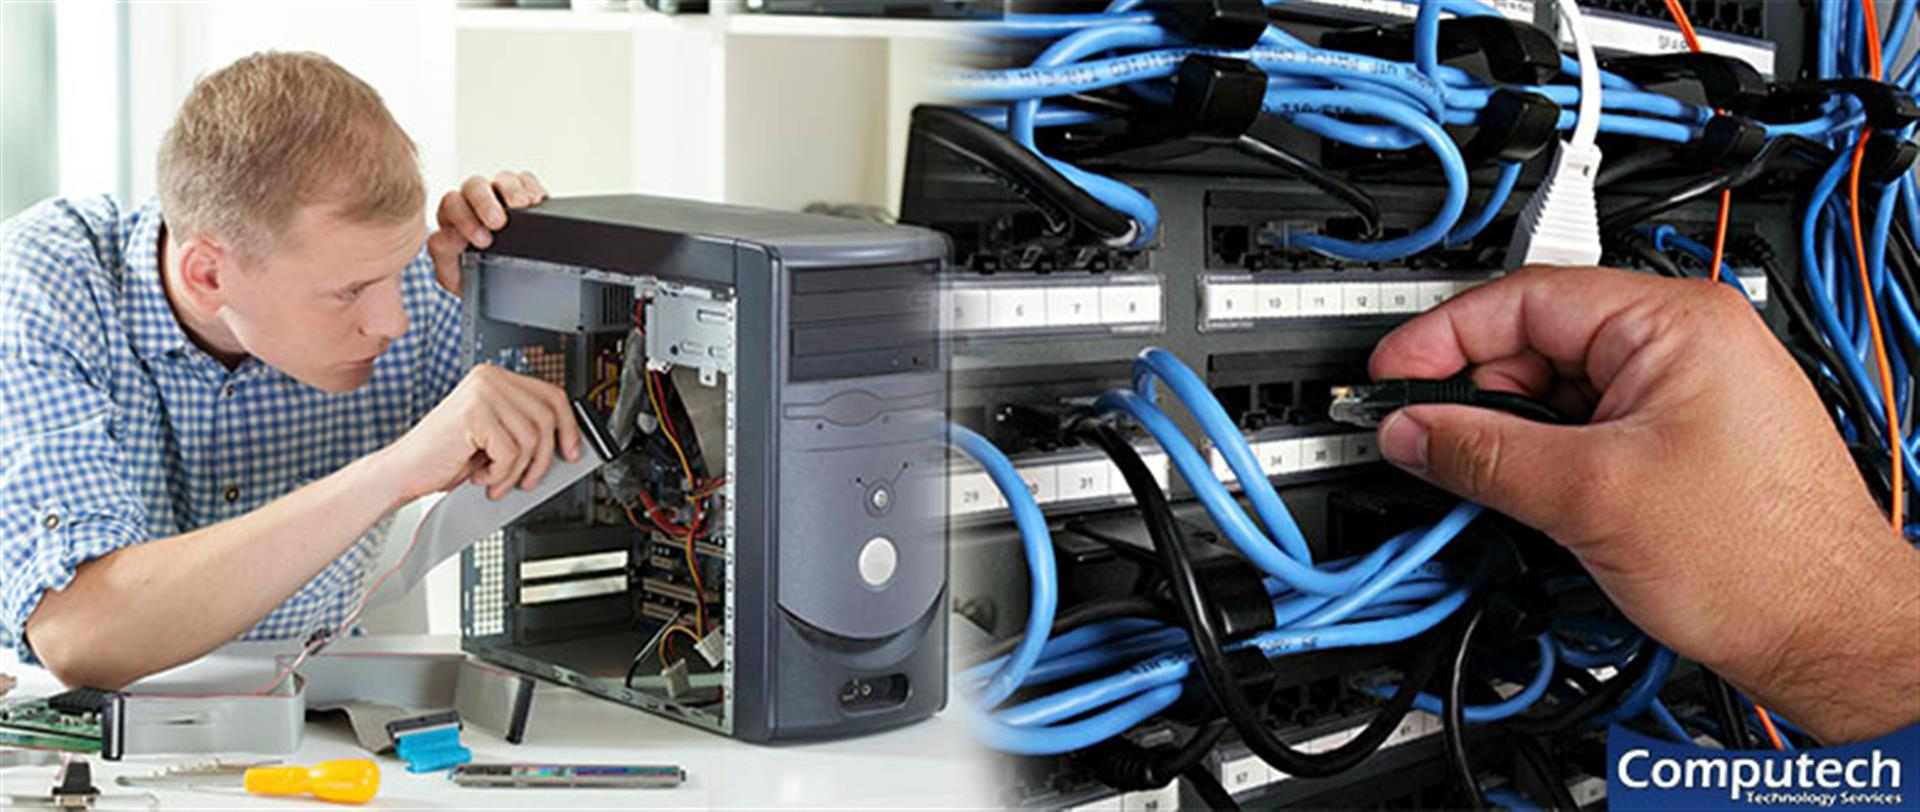 Thomson Georgia On Site Computer & Printer Repair, Network, Voice & Data Cabling Contractors